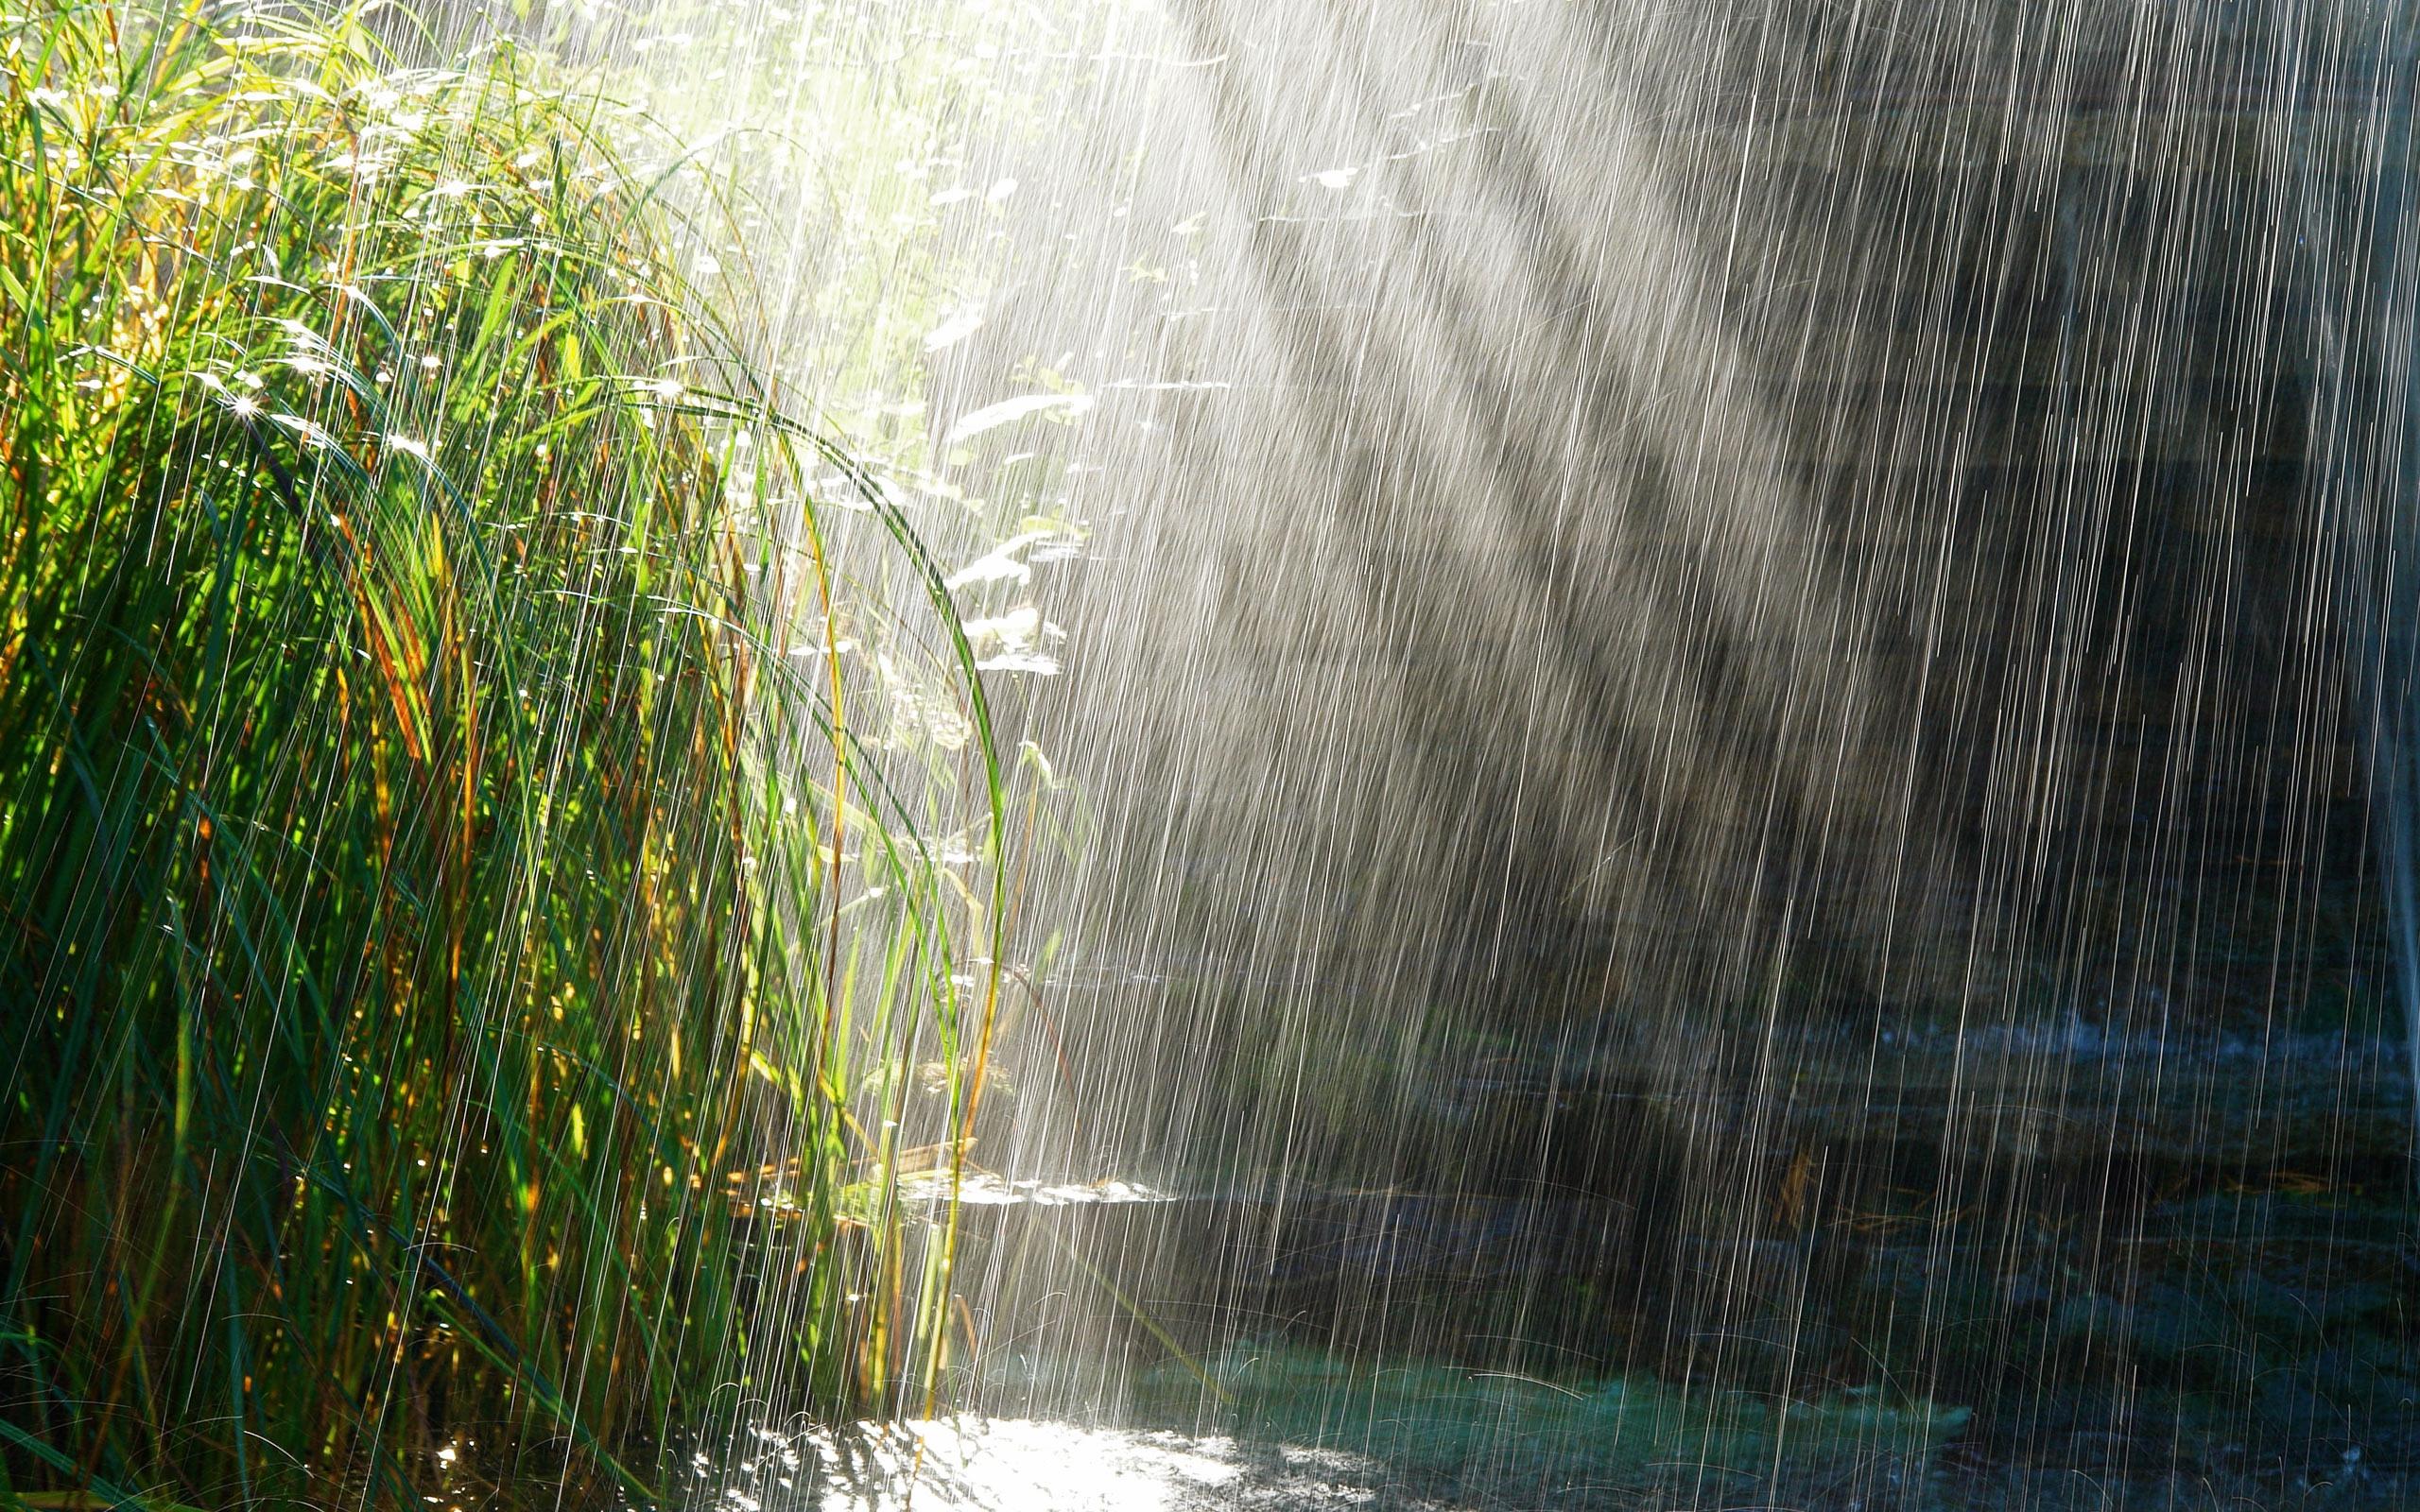 Rainy Day Bing Images